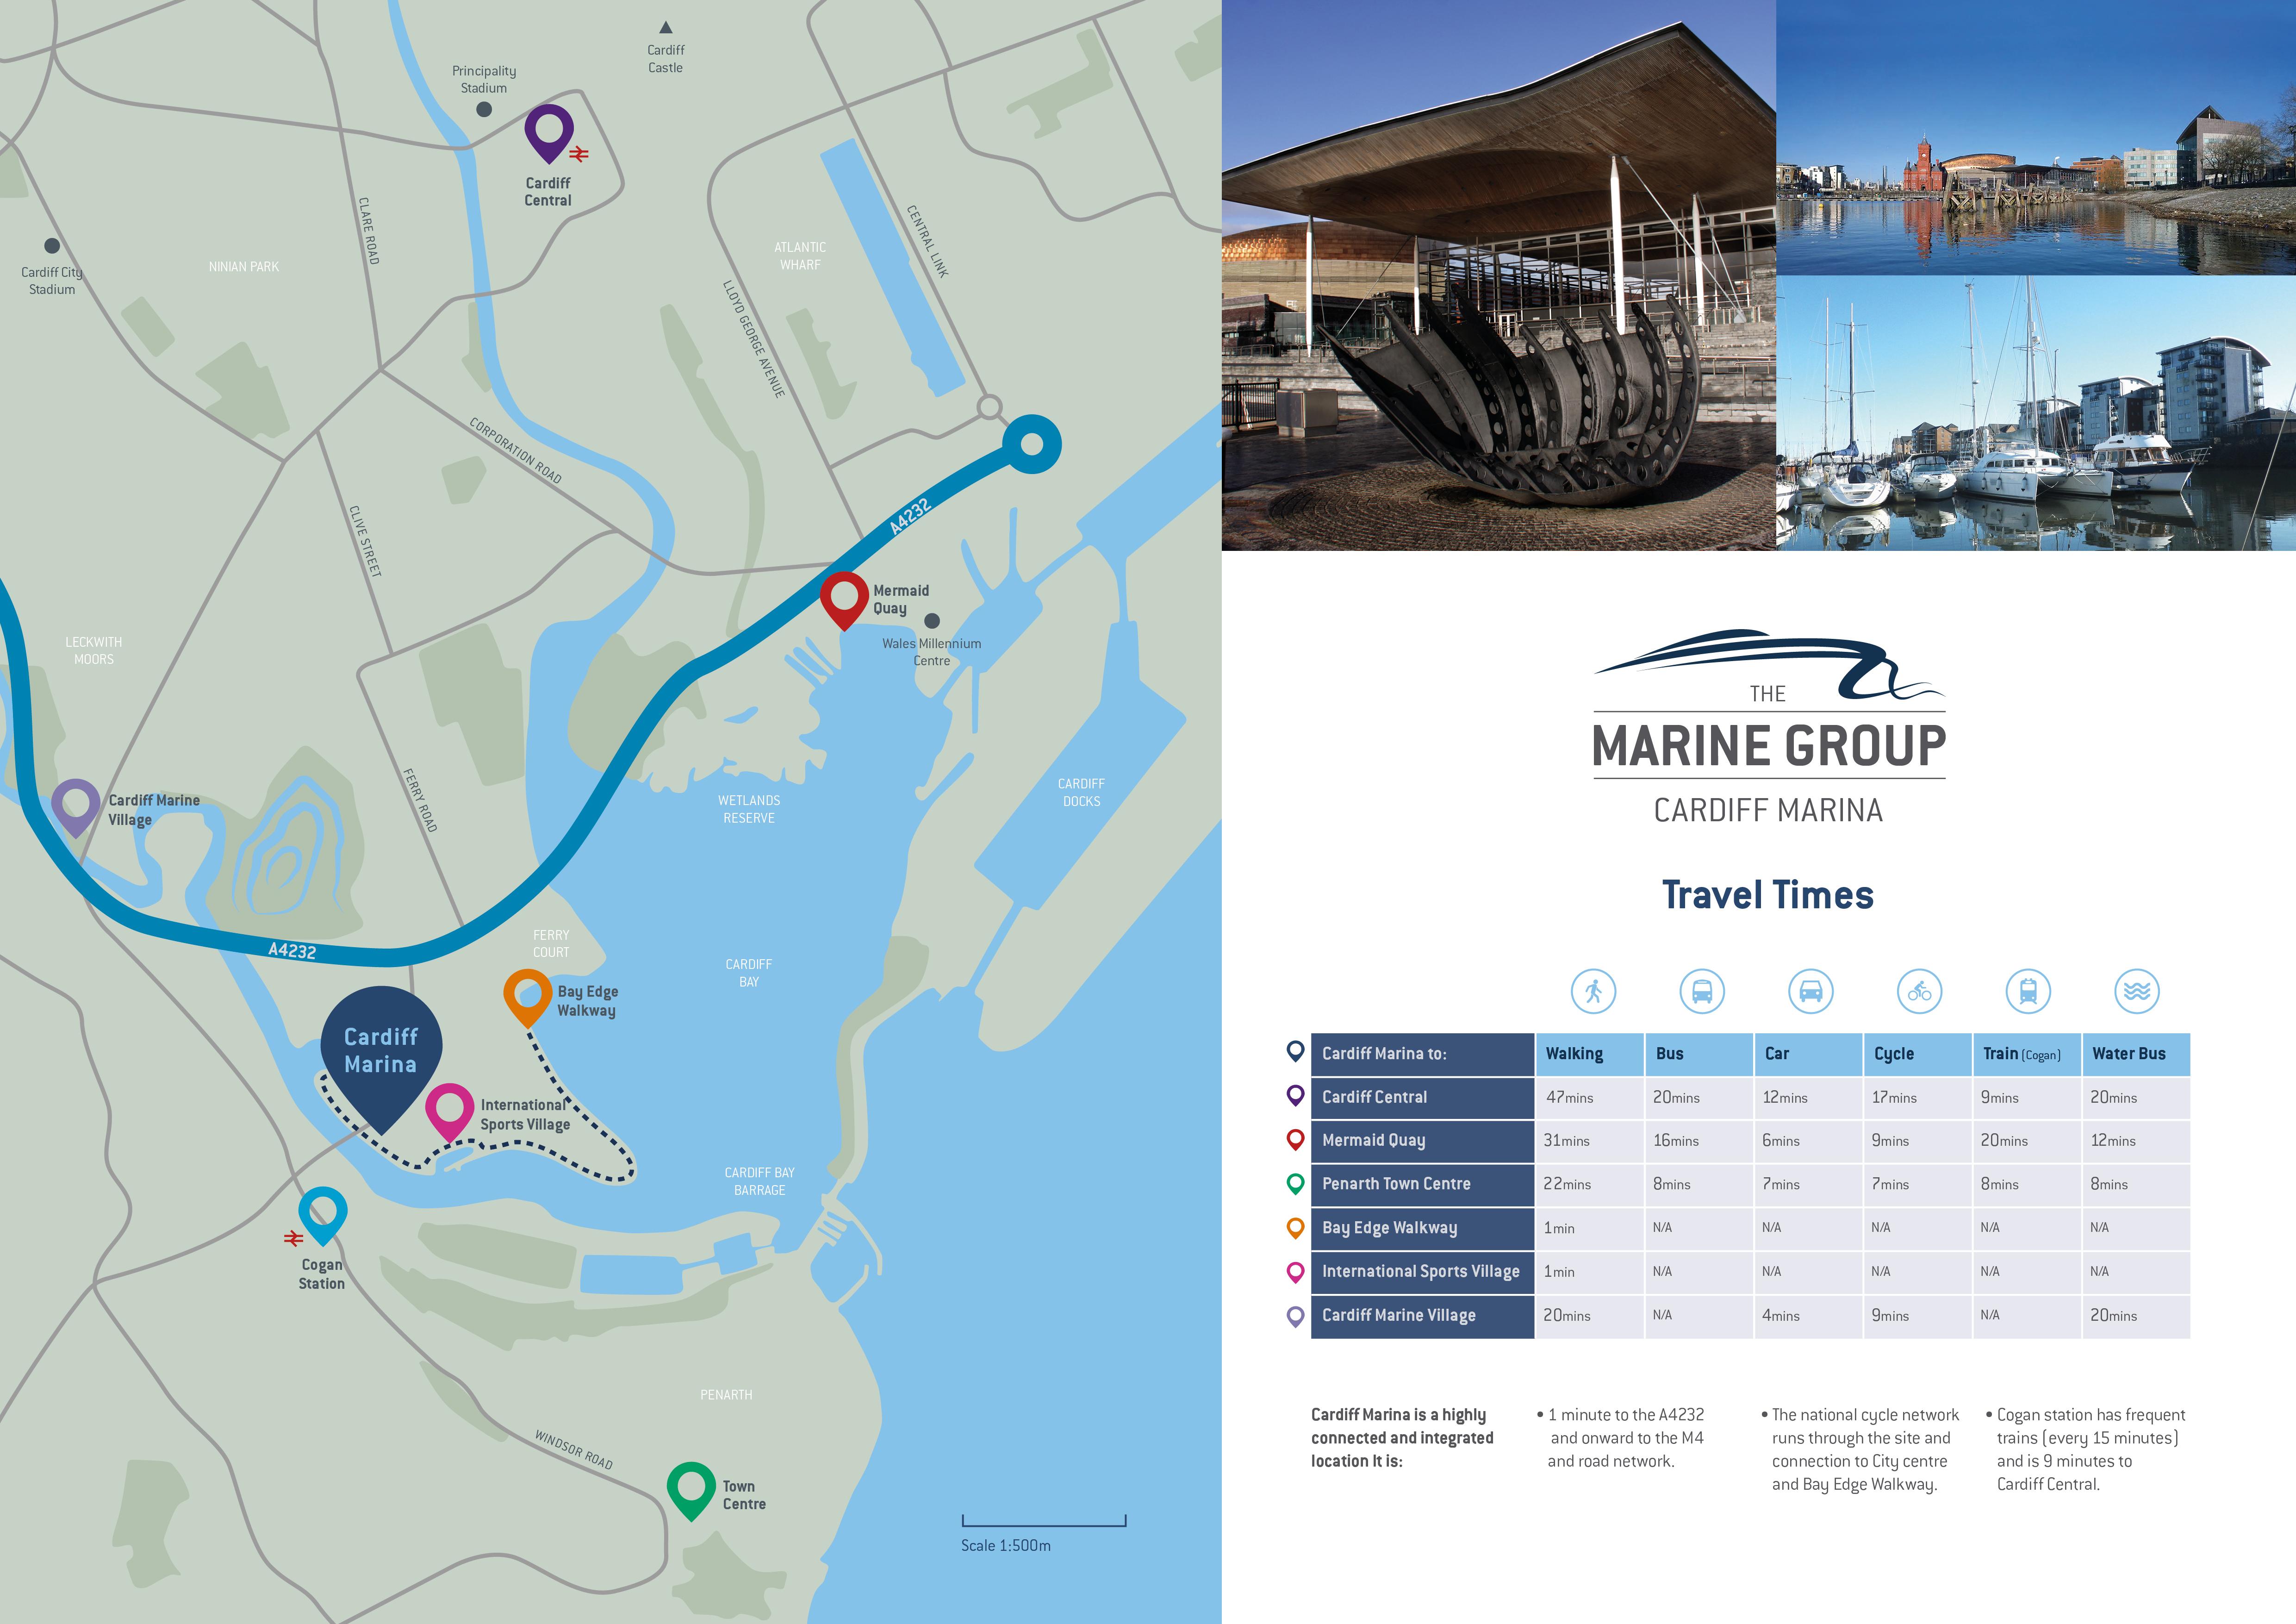 Cardiff Marina The Marine Group